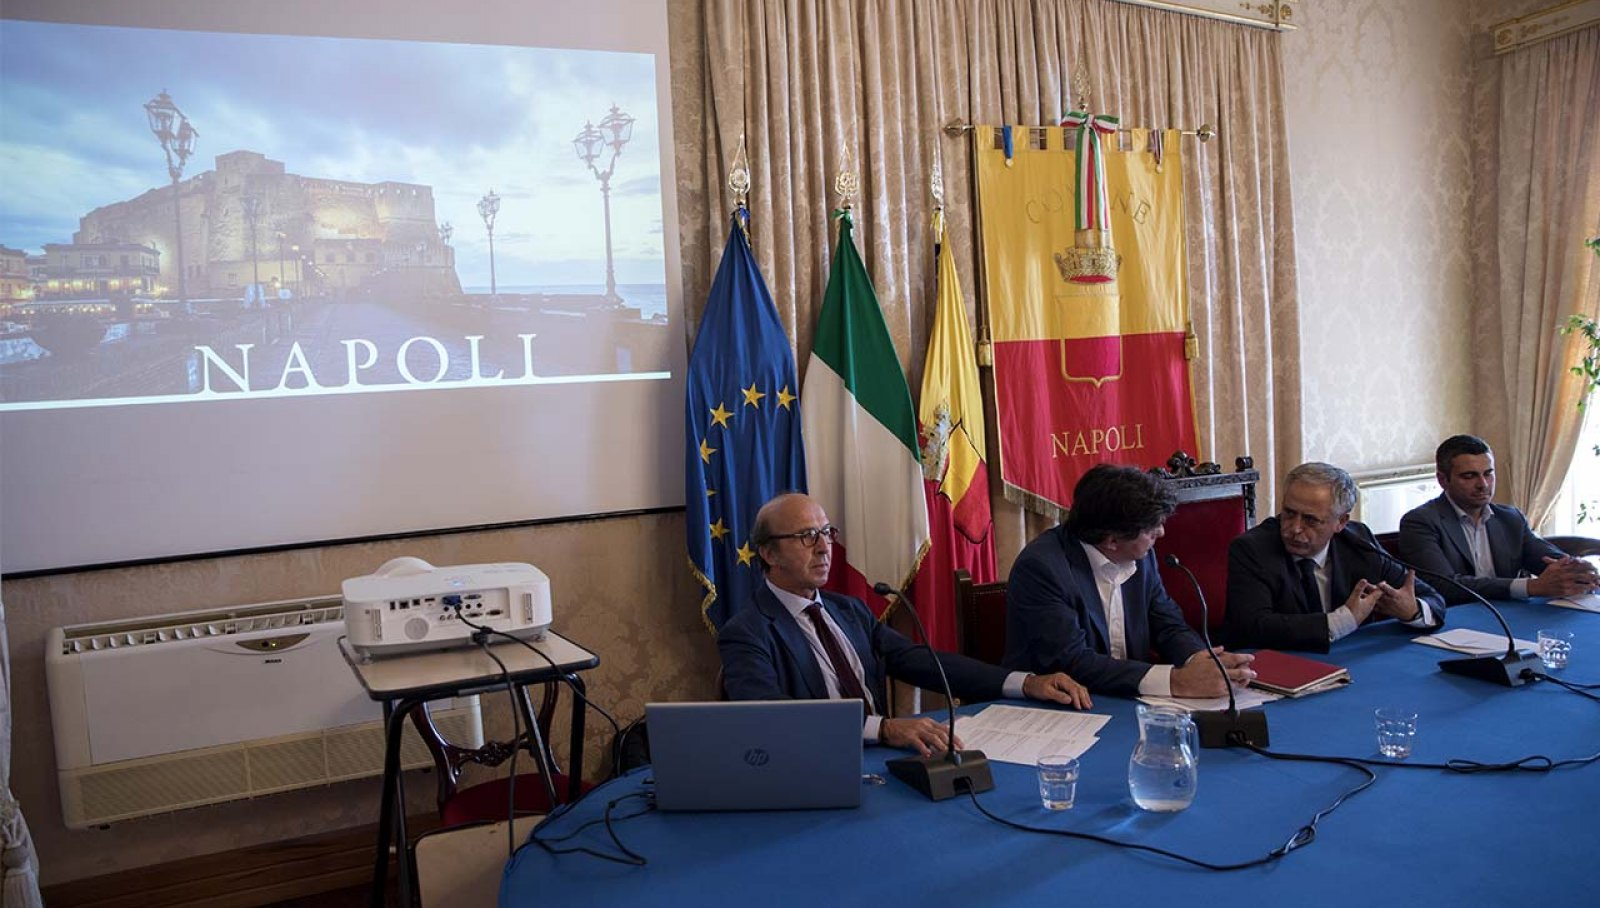 Campagna_Segnali_D'Italia_IGPDecaux_2018_Napoli